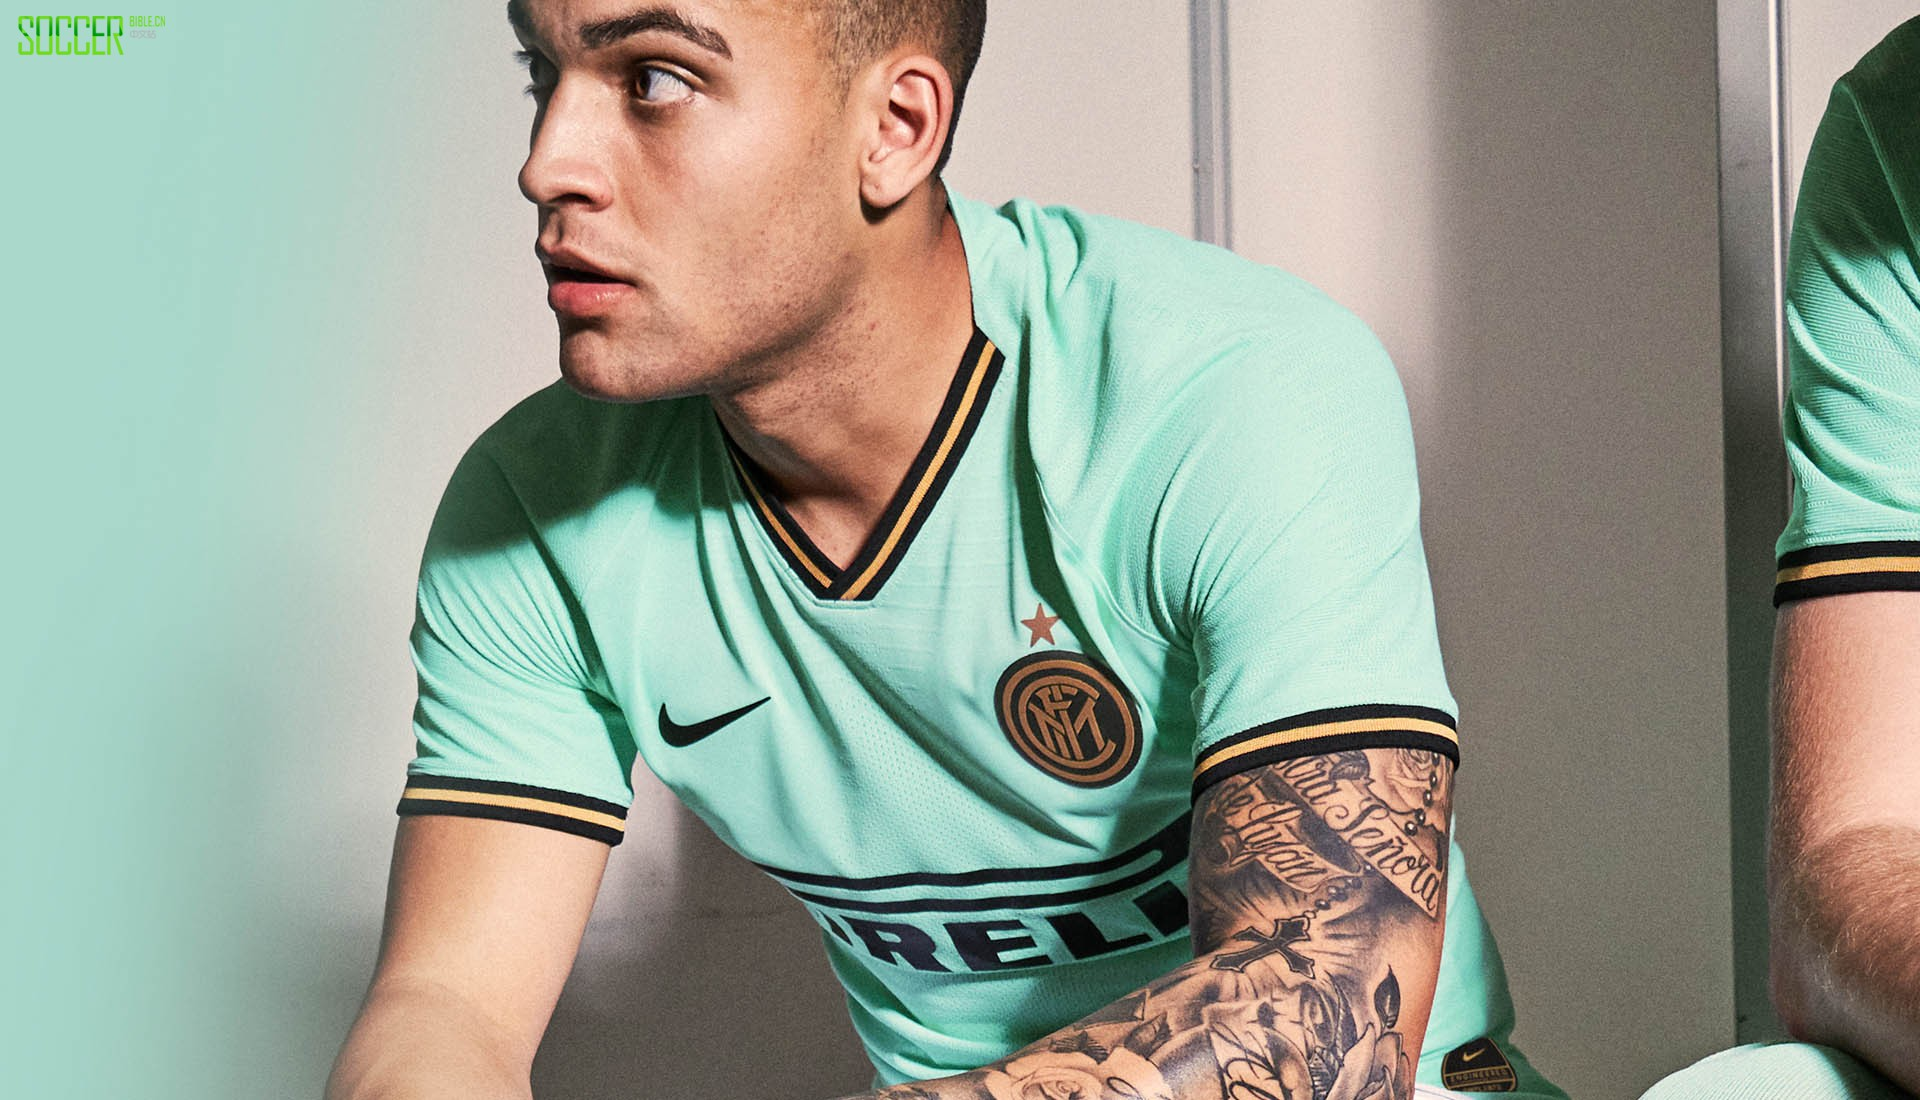 《SoccerBible》评选出的十年前TOP 30球衣